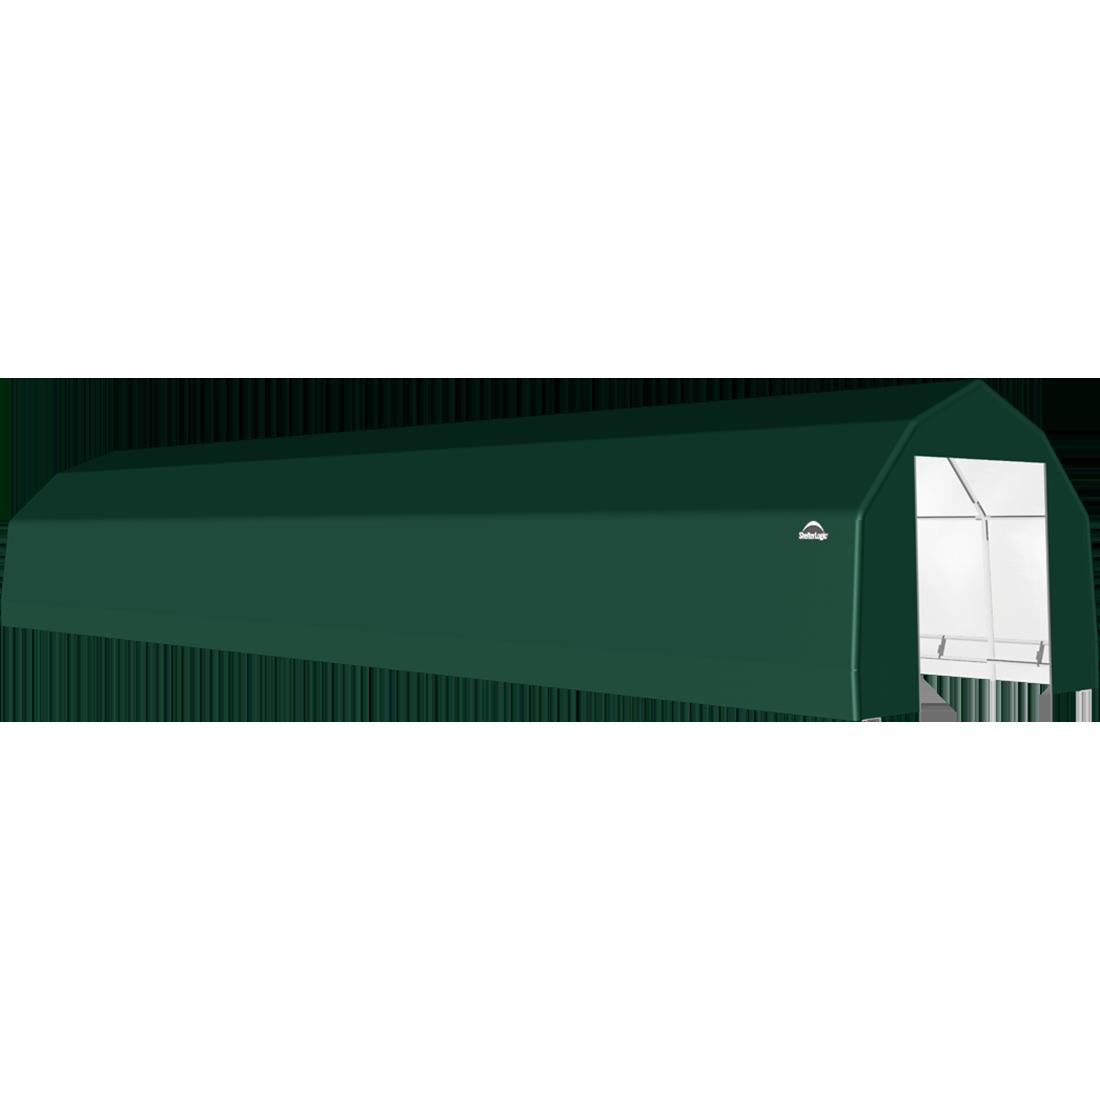 SP Barn 15X56X11 Green 14 oz PE Shelter